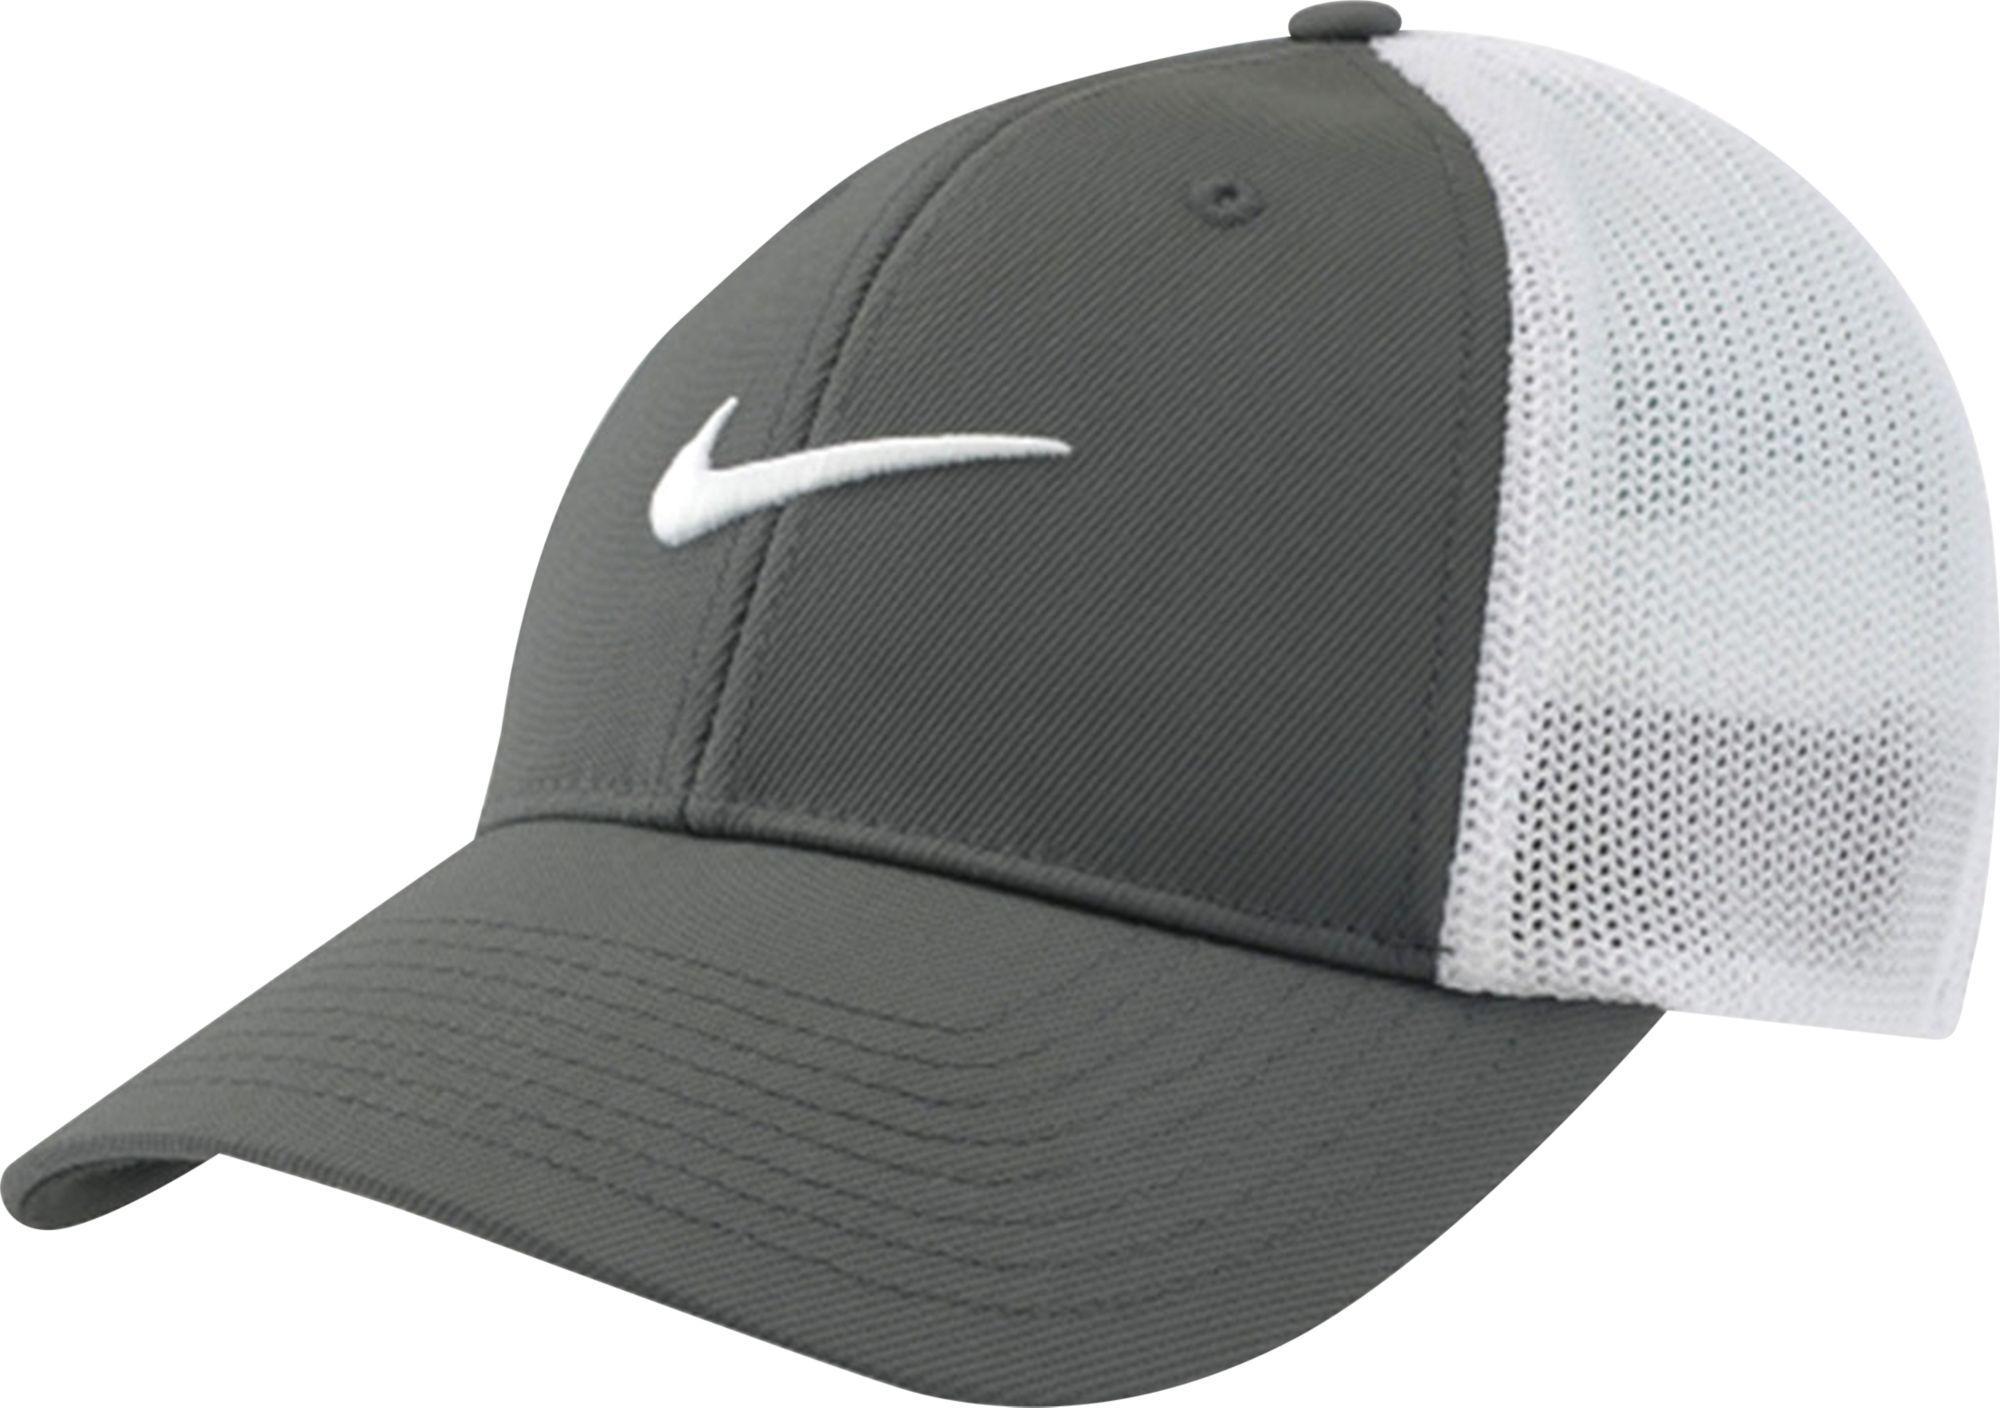 321db4a9 Lyst - Nike Flex Fit Golf Hat in Gray for Men